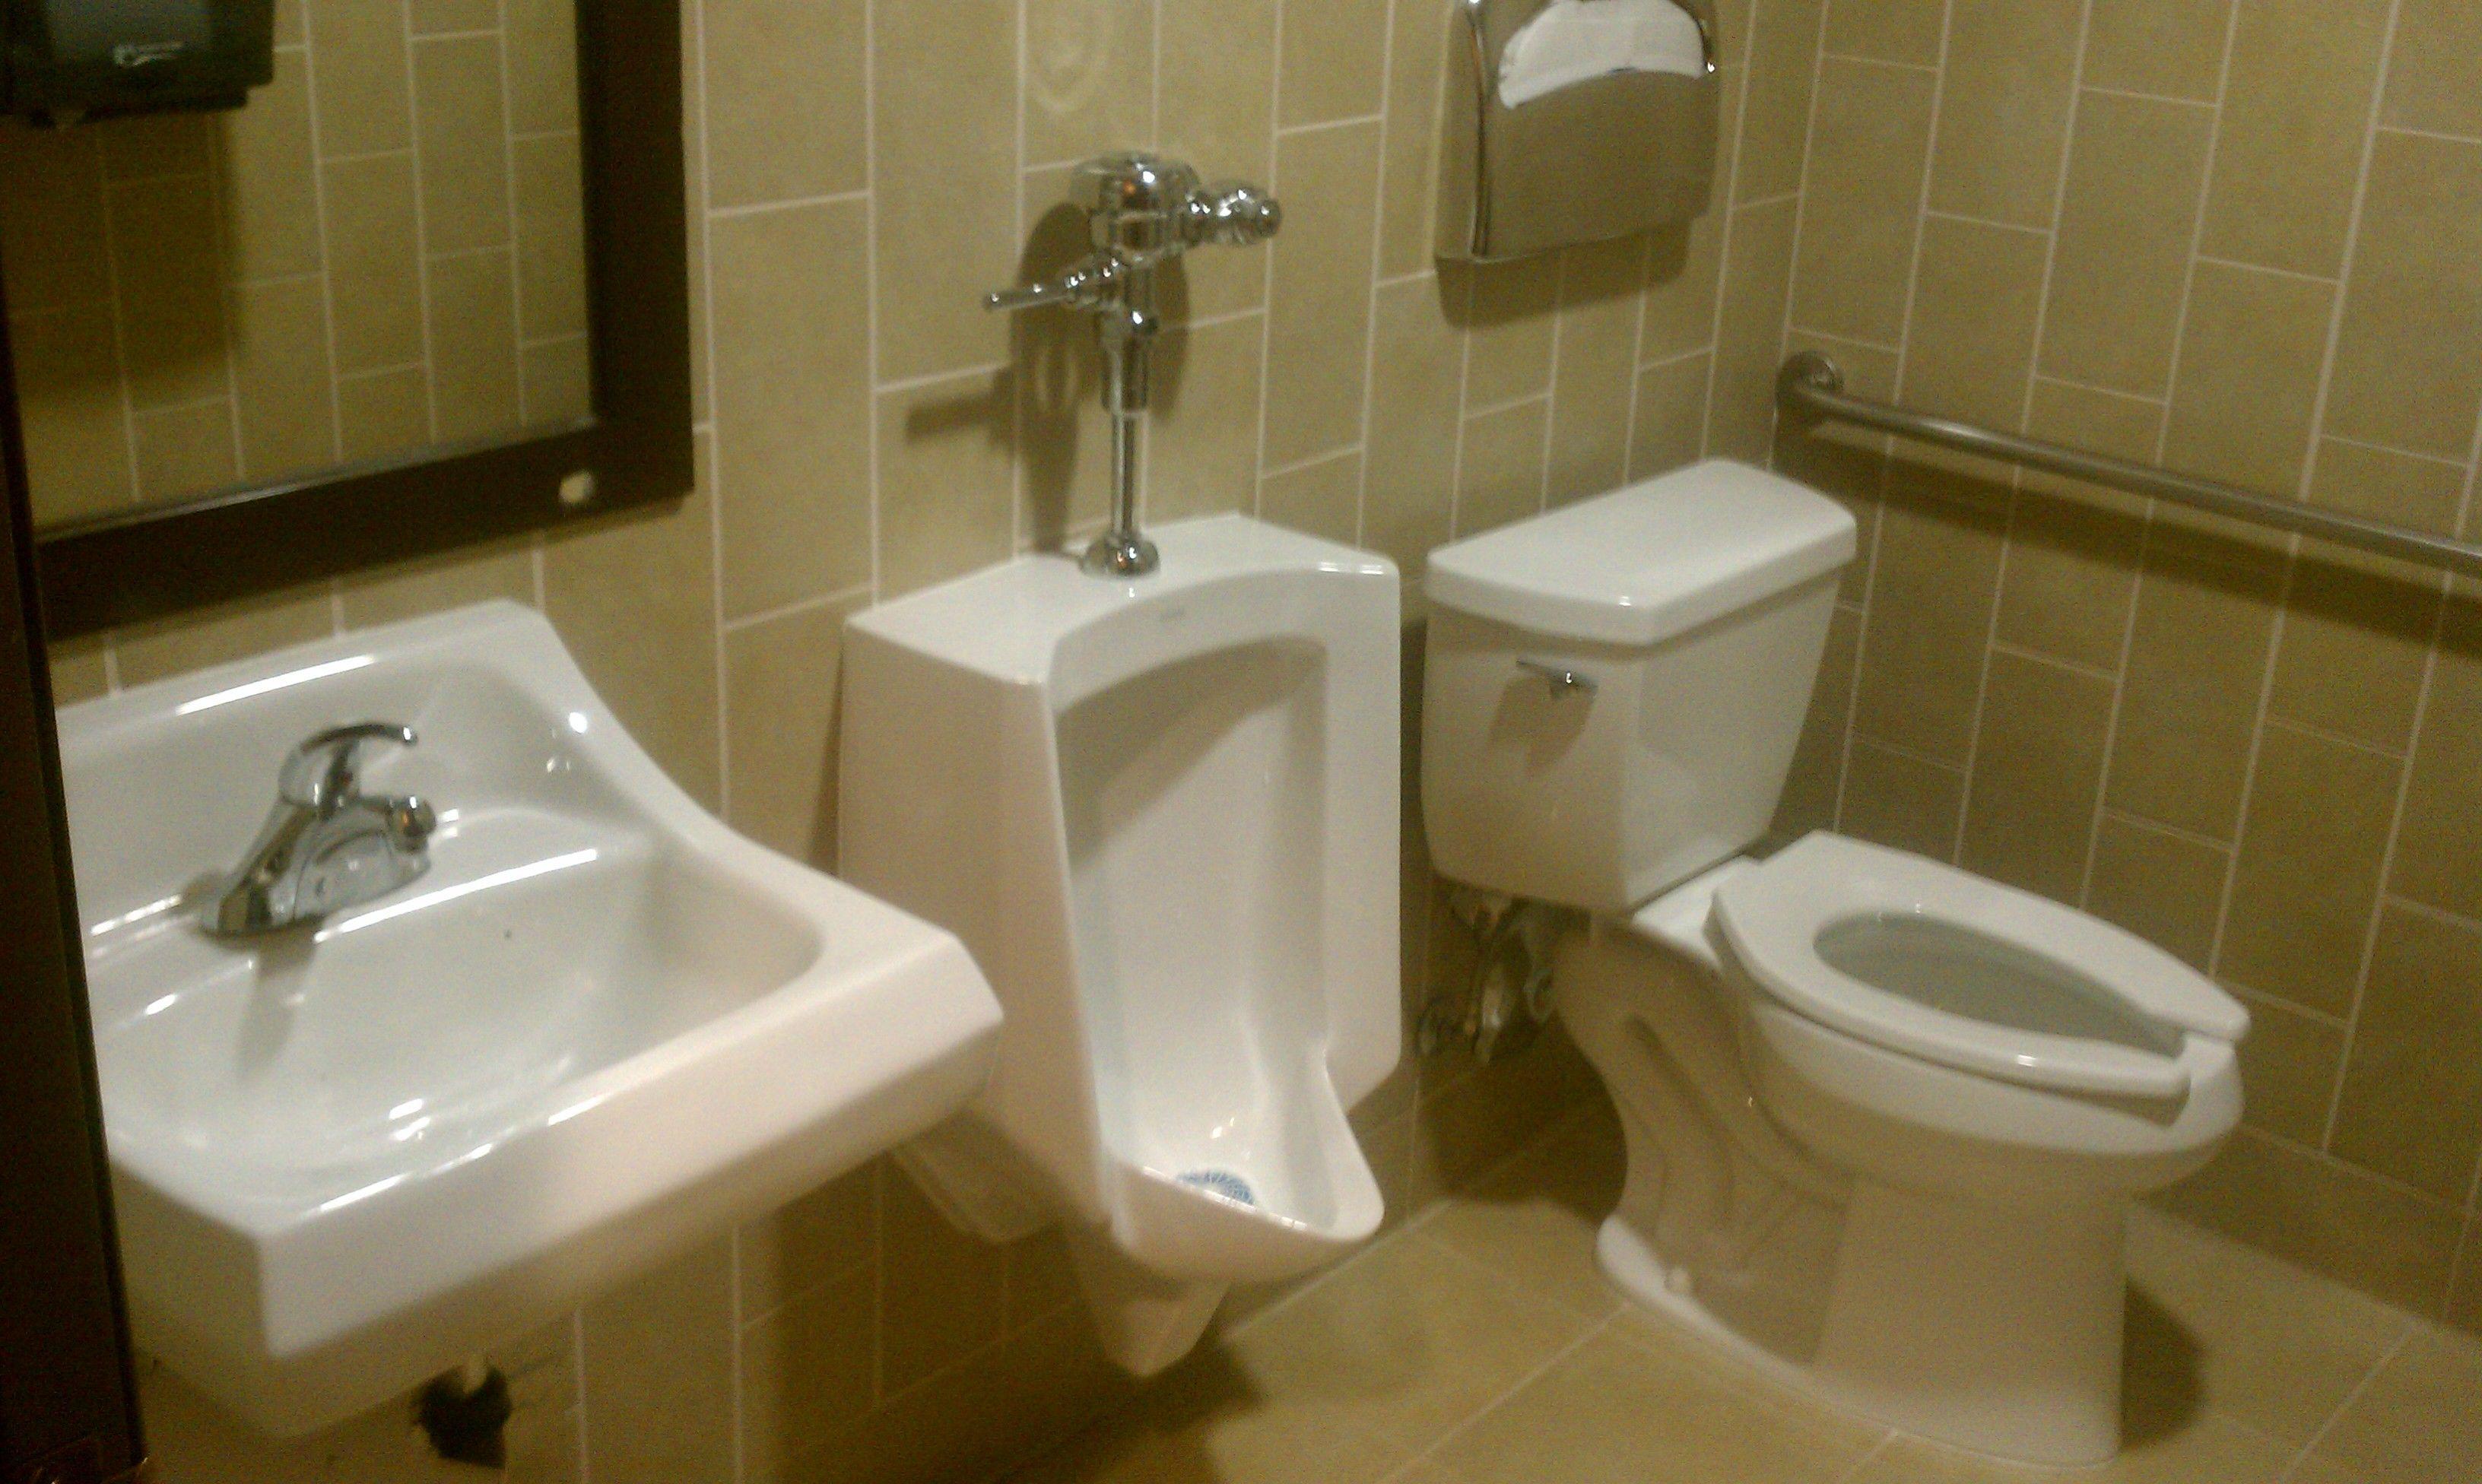 Bathroom Fixtures Tucson simple-commercial-bathroom-fixtures-commercial-bathroom-fixtures